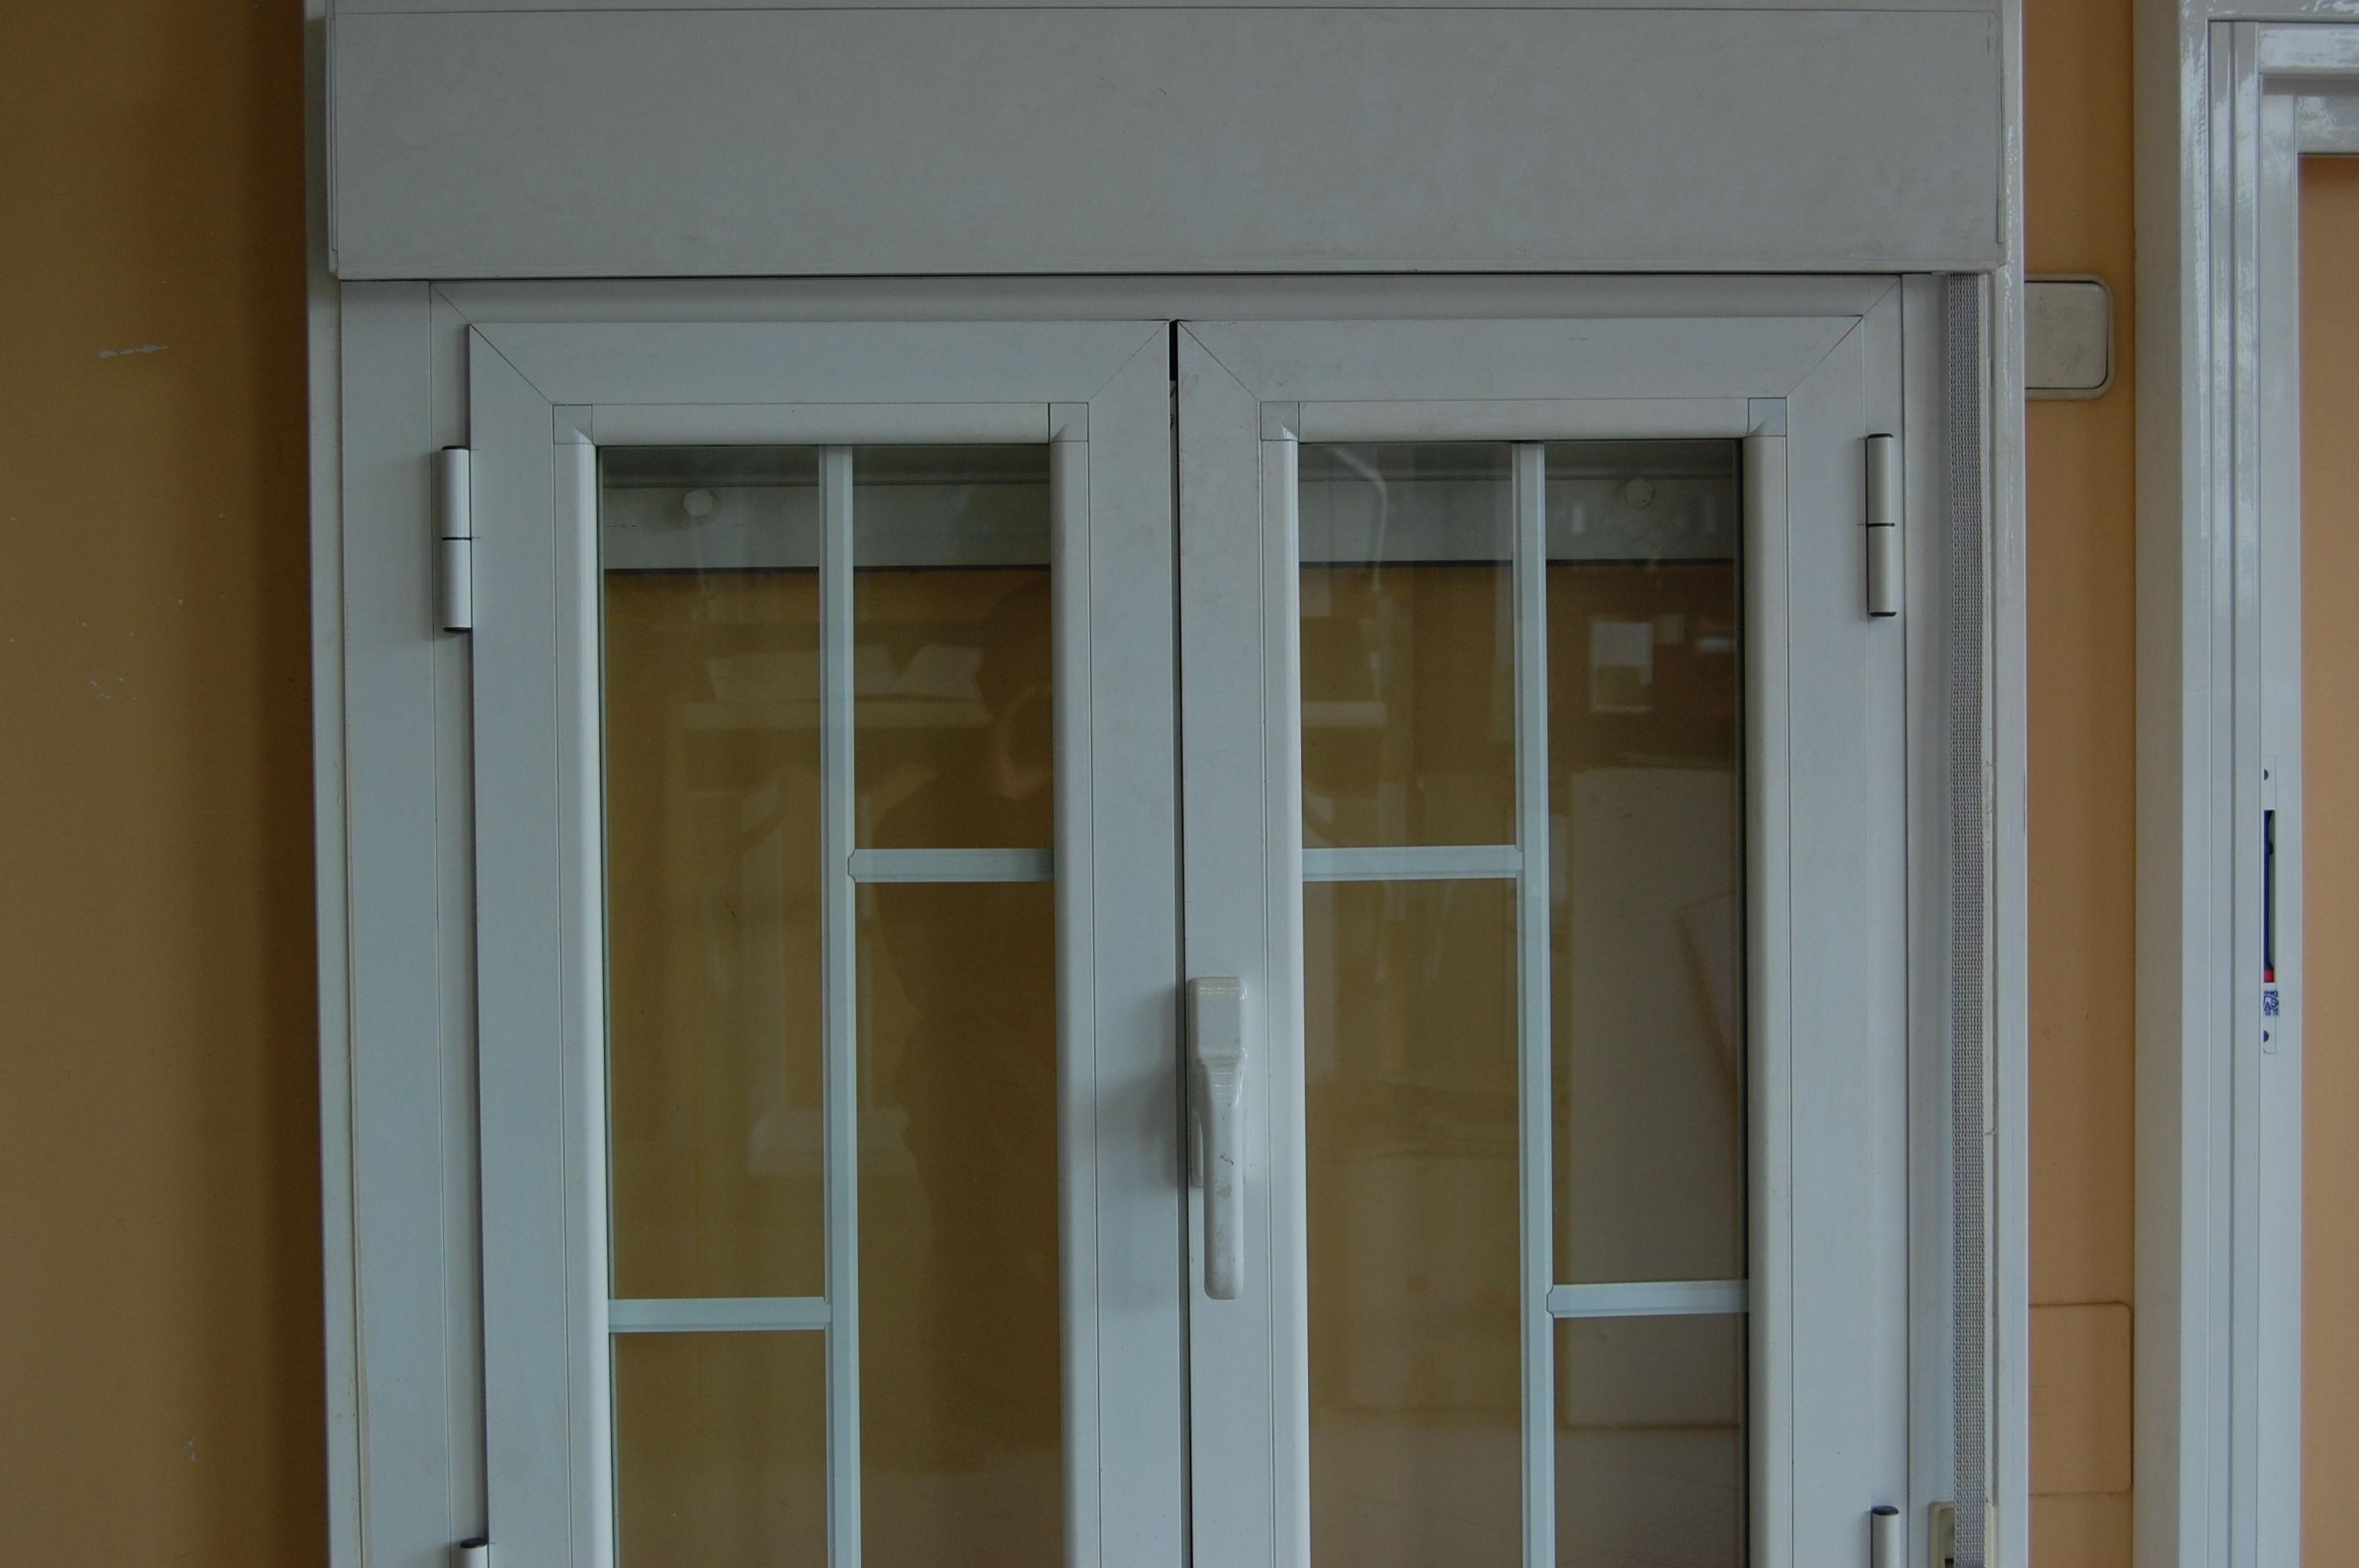 Catalogo ventanas aluminio car interior design - Precio de ventanas de aluminio ...